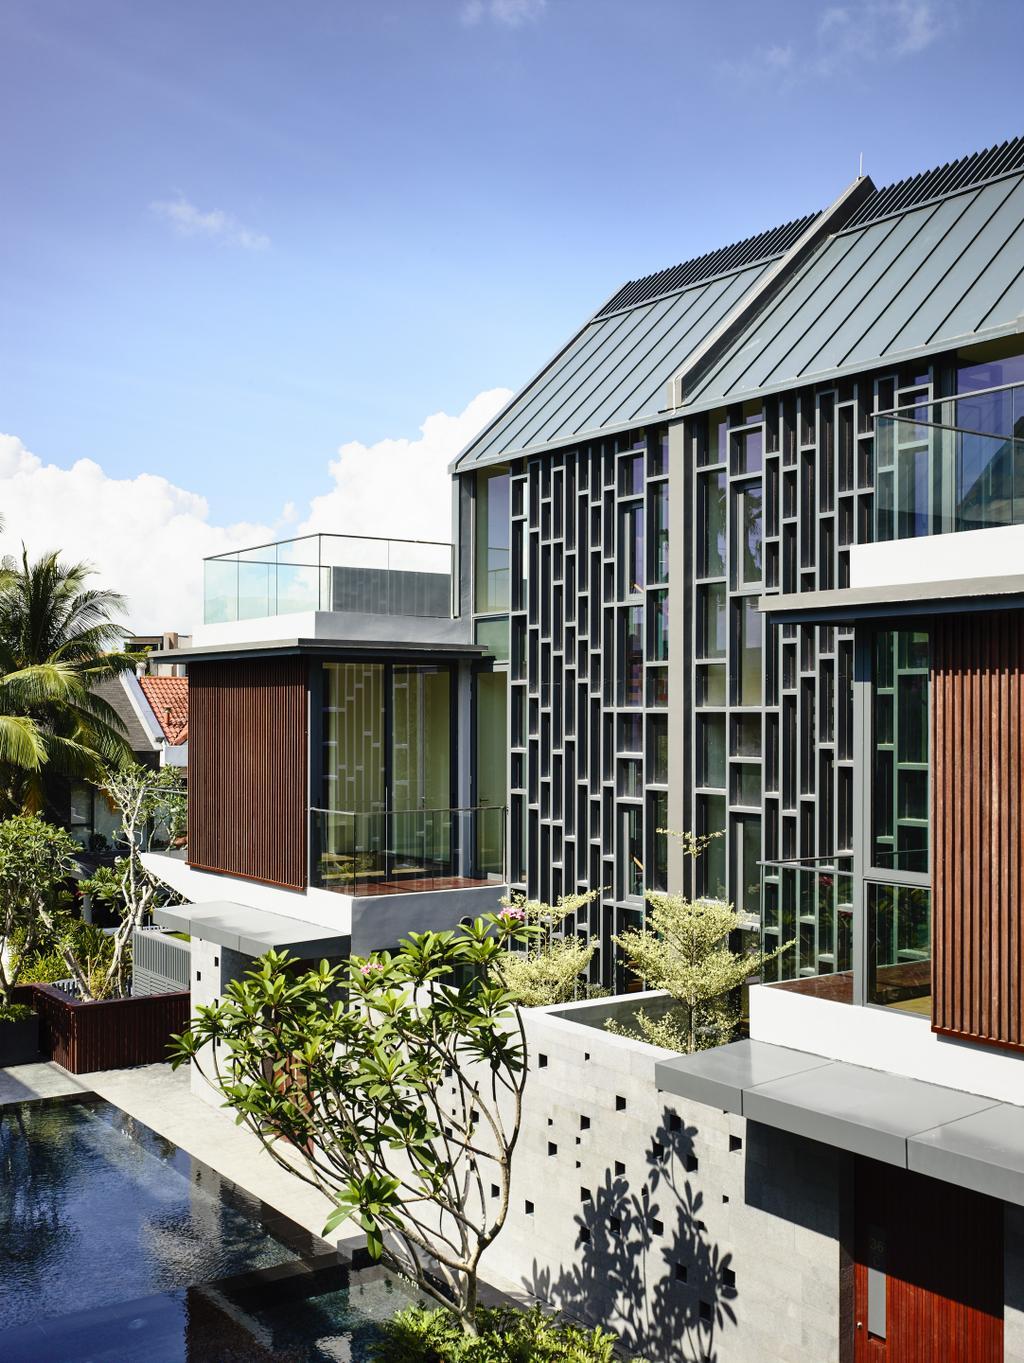 Modern, Landed, Toh Crescent, Architect, HYLA Architects, Flora, Jar, Plant, Potted Plant, Pottery, Vase, Building, House, Housing, Villa